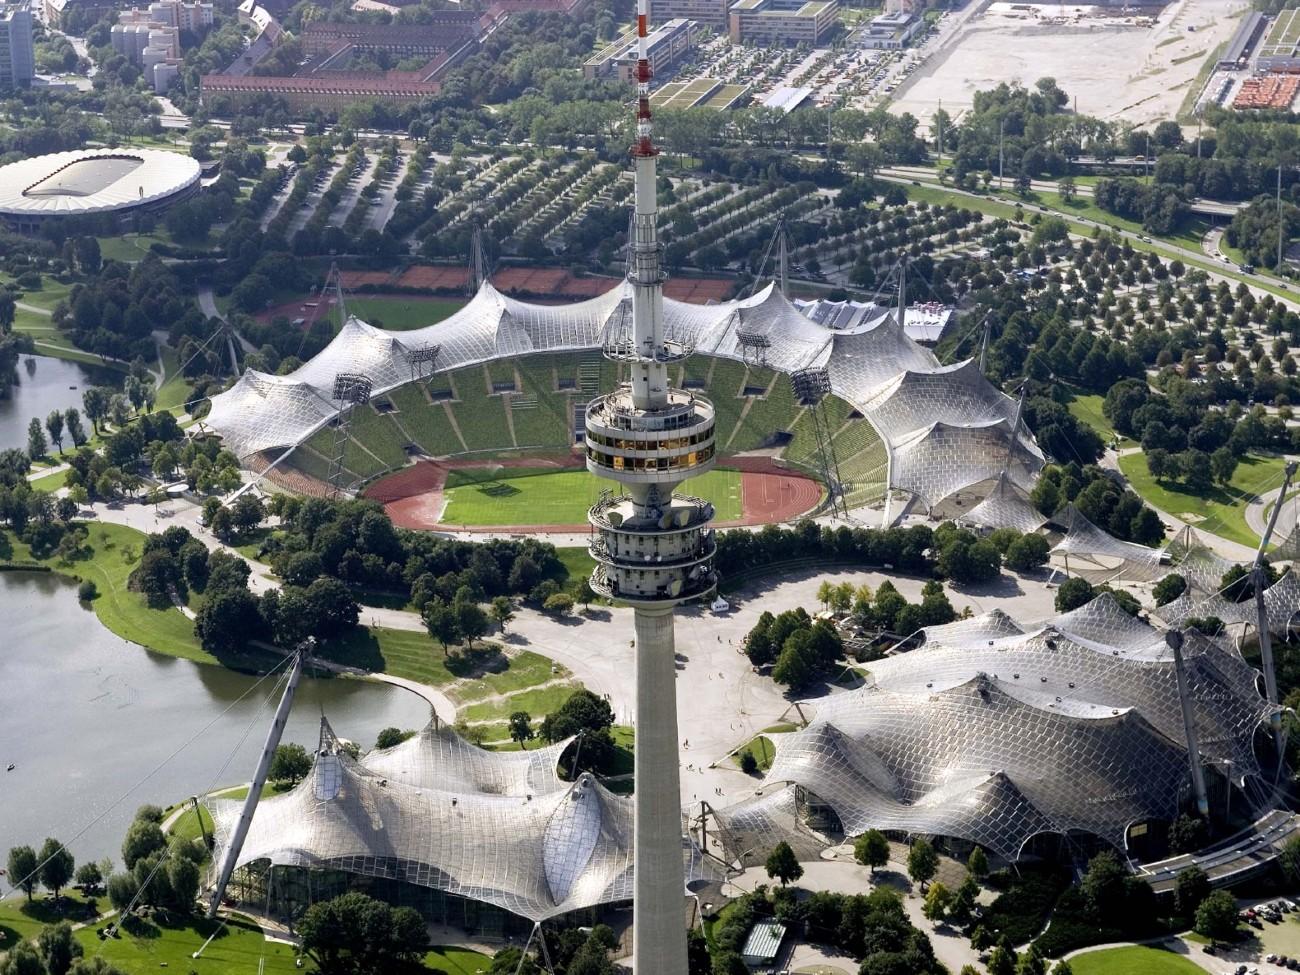 Photo: ZDF achieves DVB-T2 upgrade across Germany